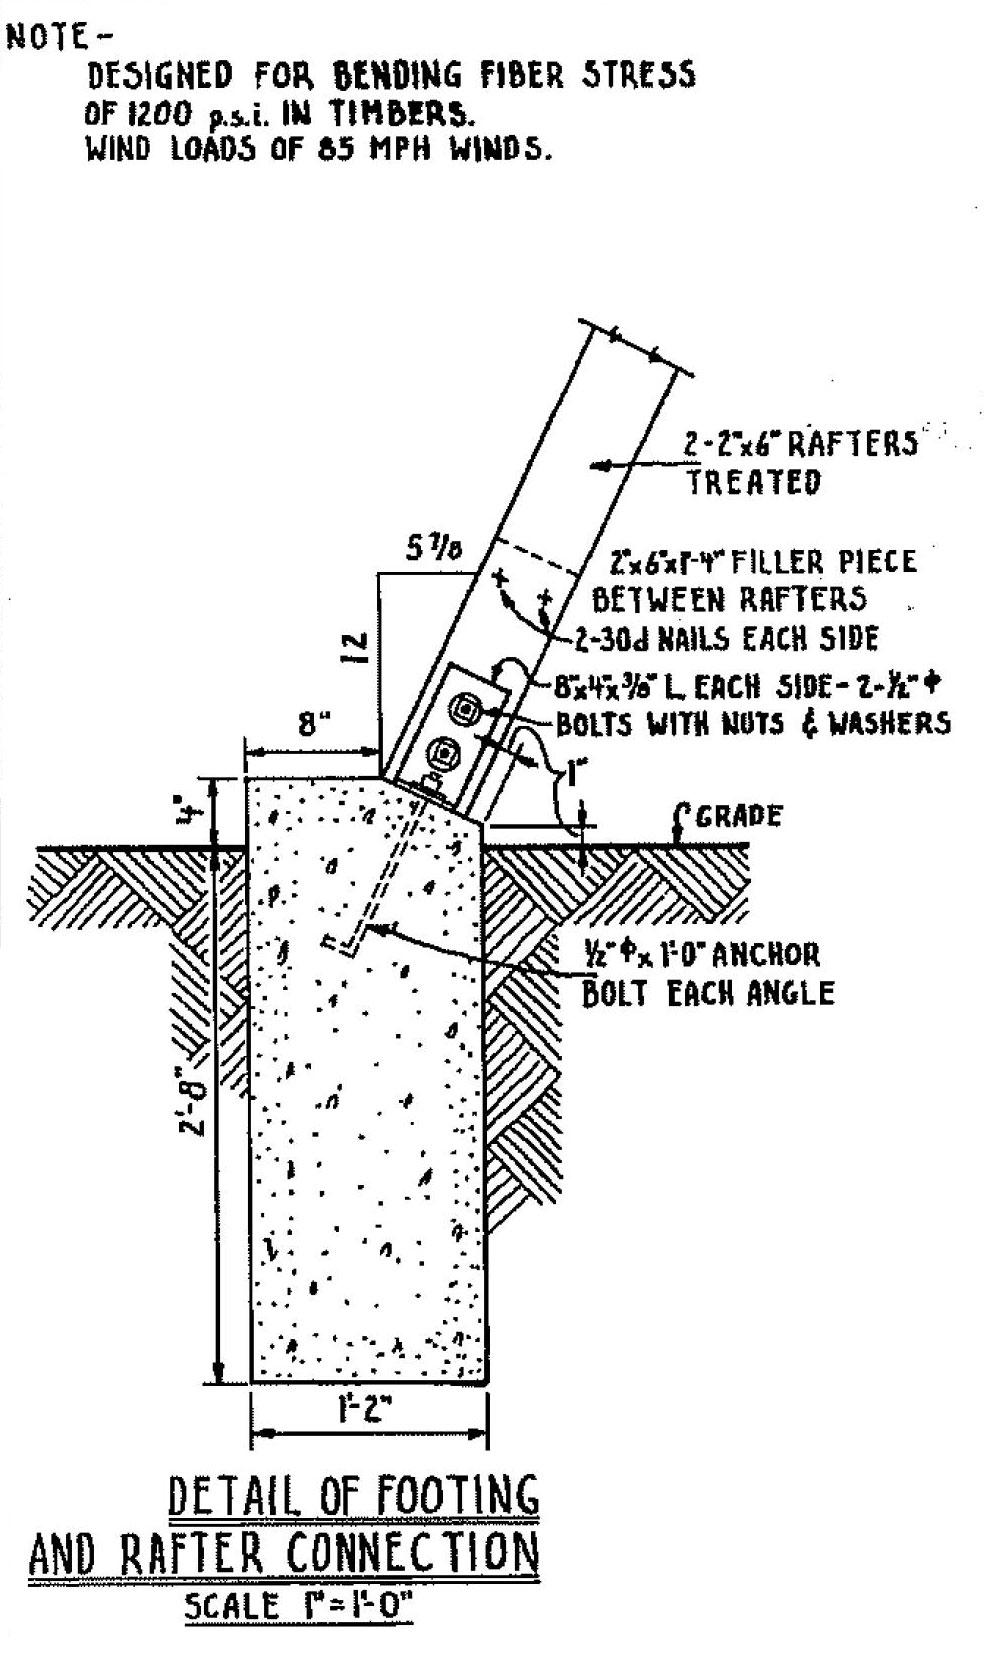 Free wood shed plans materials list, free gazebo bird